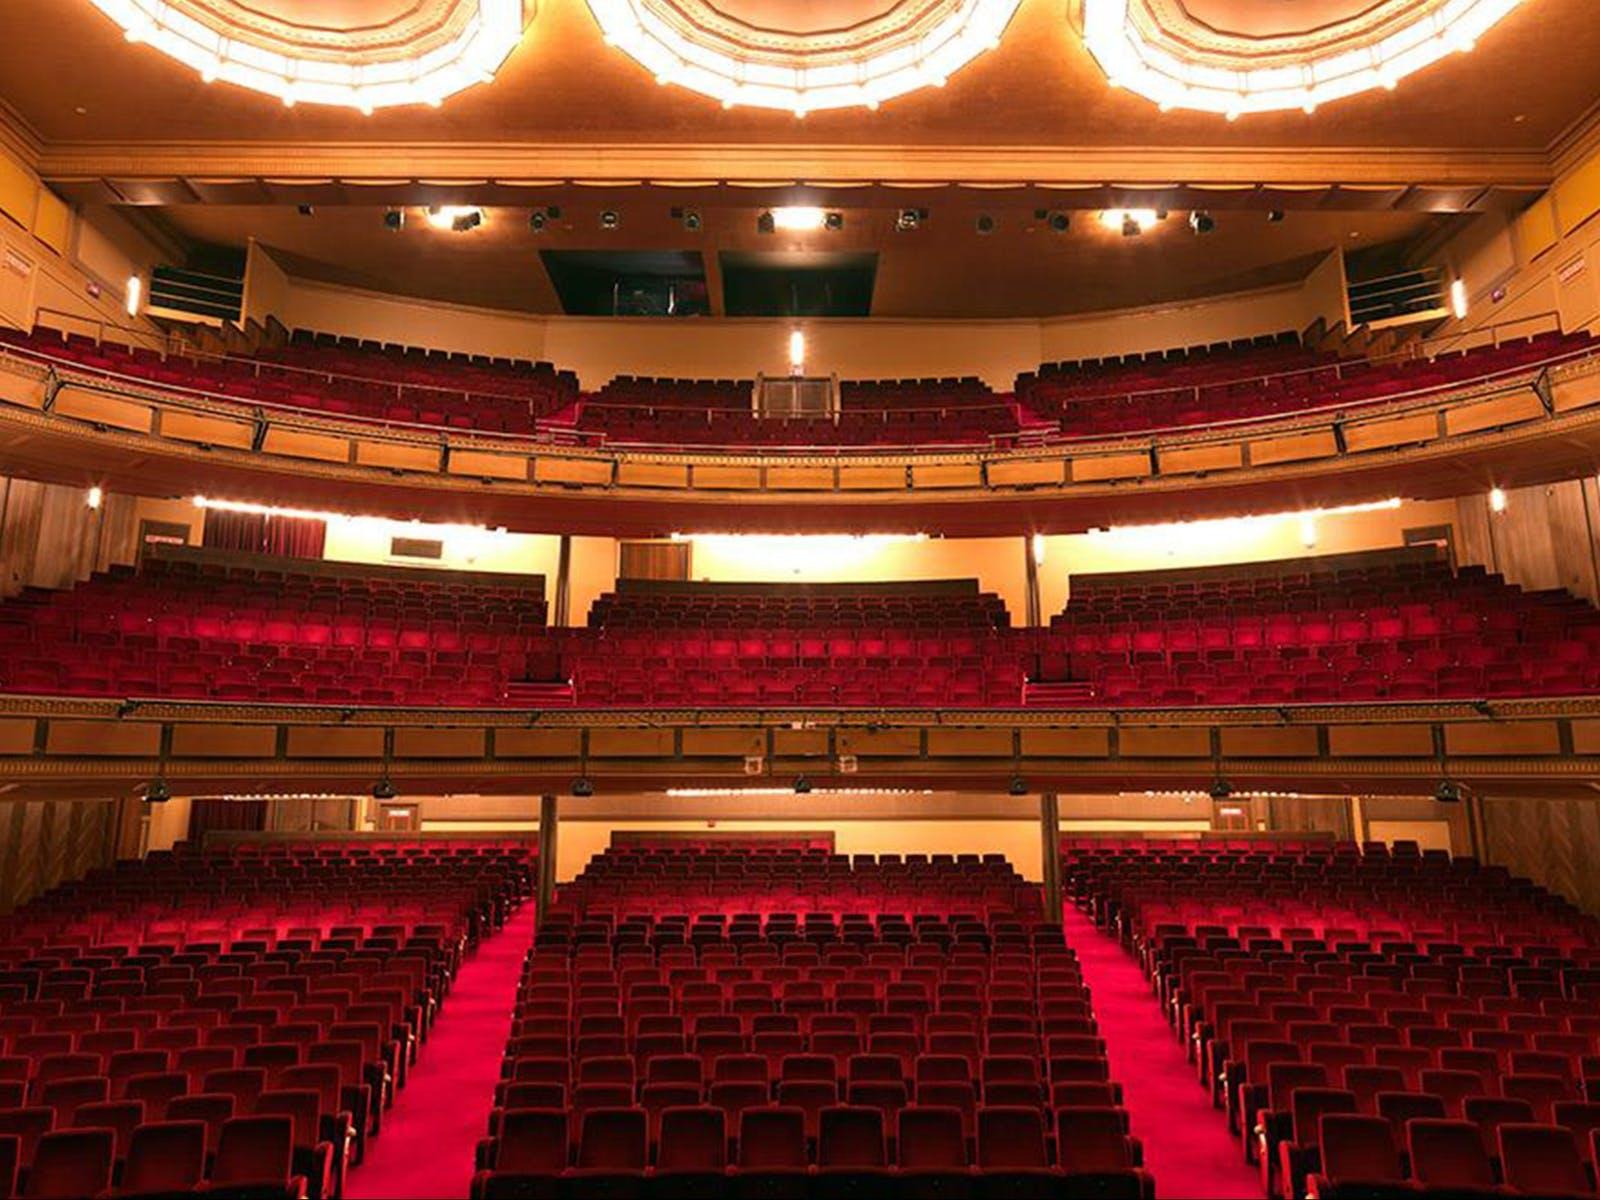 Theatre And Musicals Art And Culture Melbourne Victoria